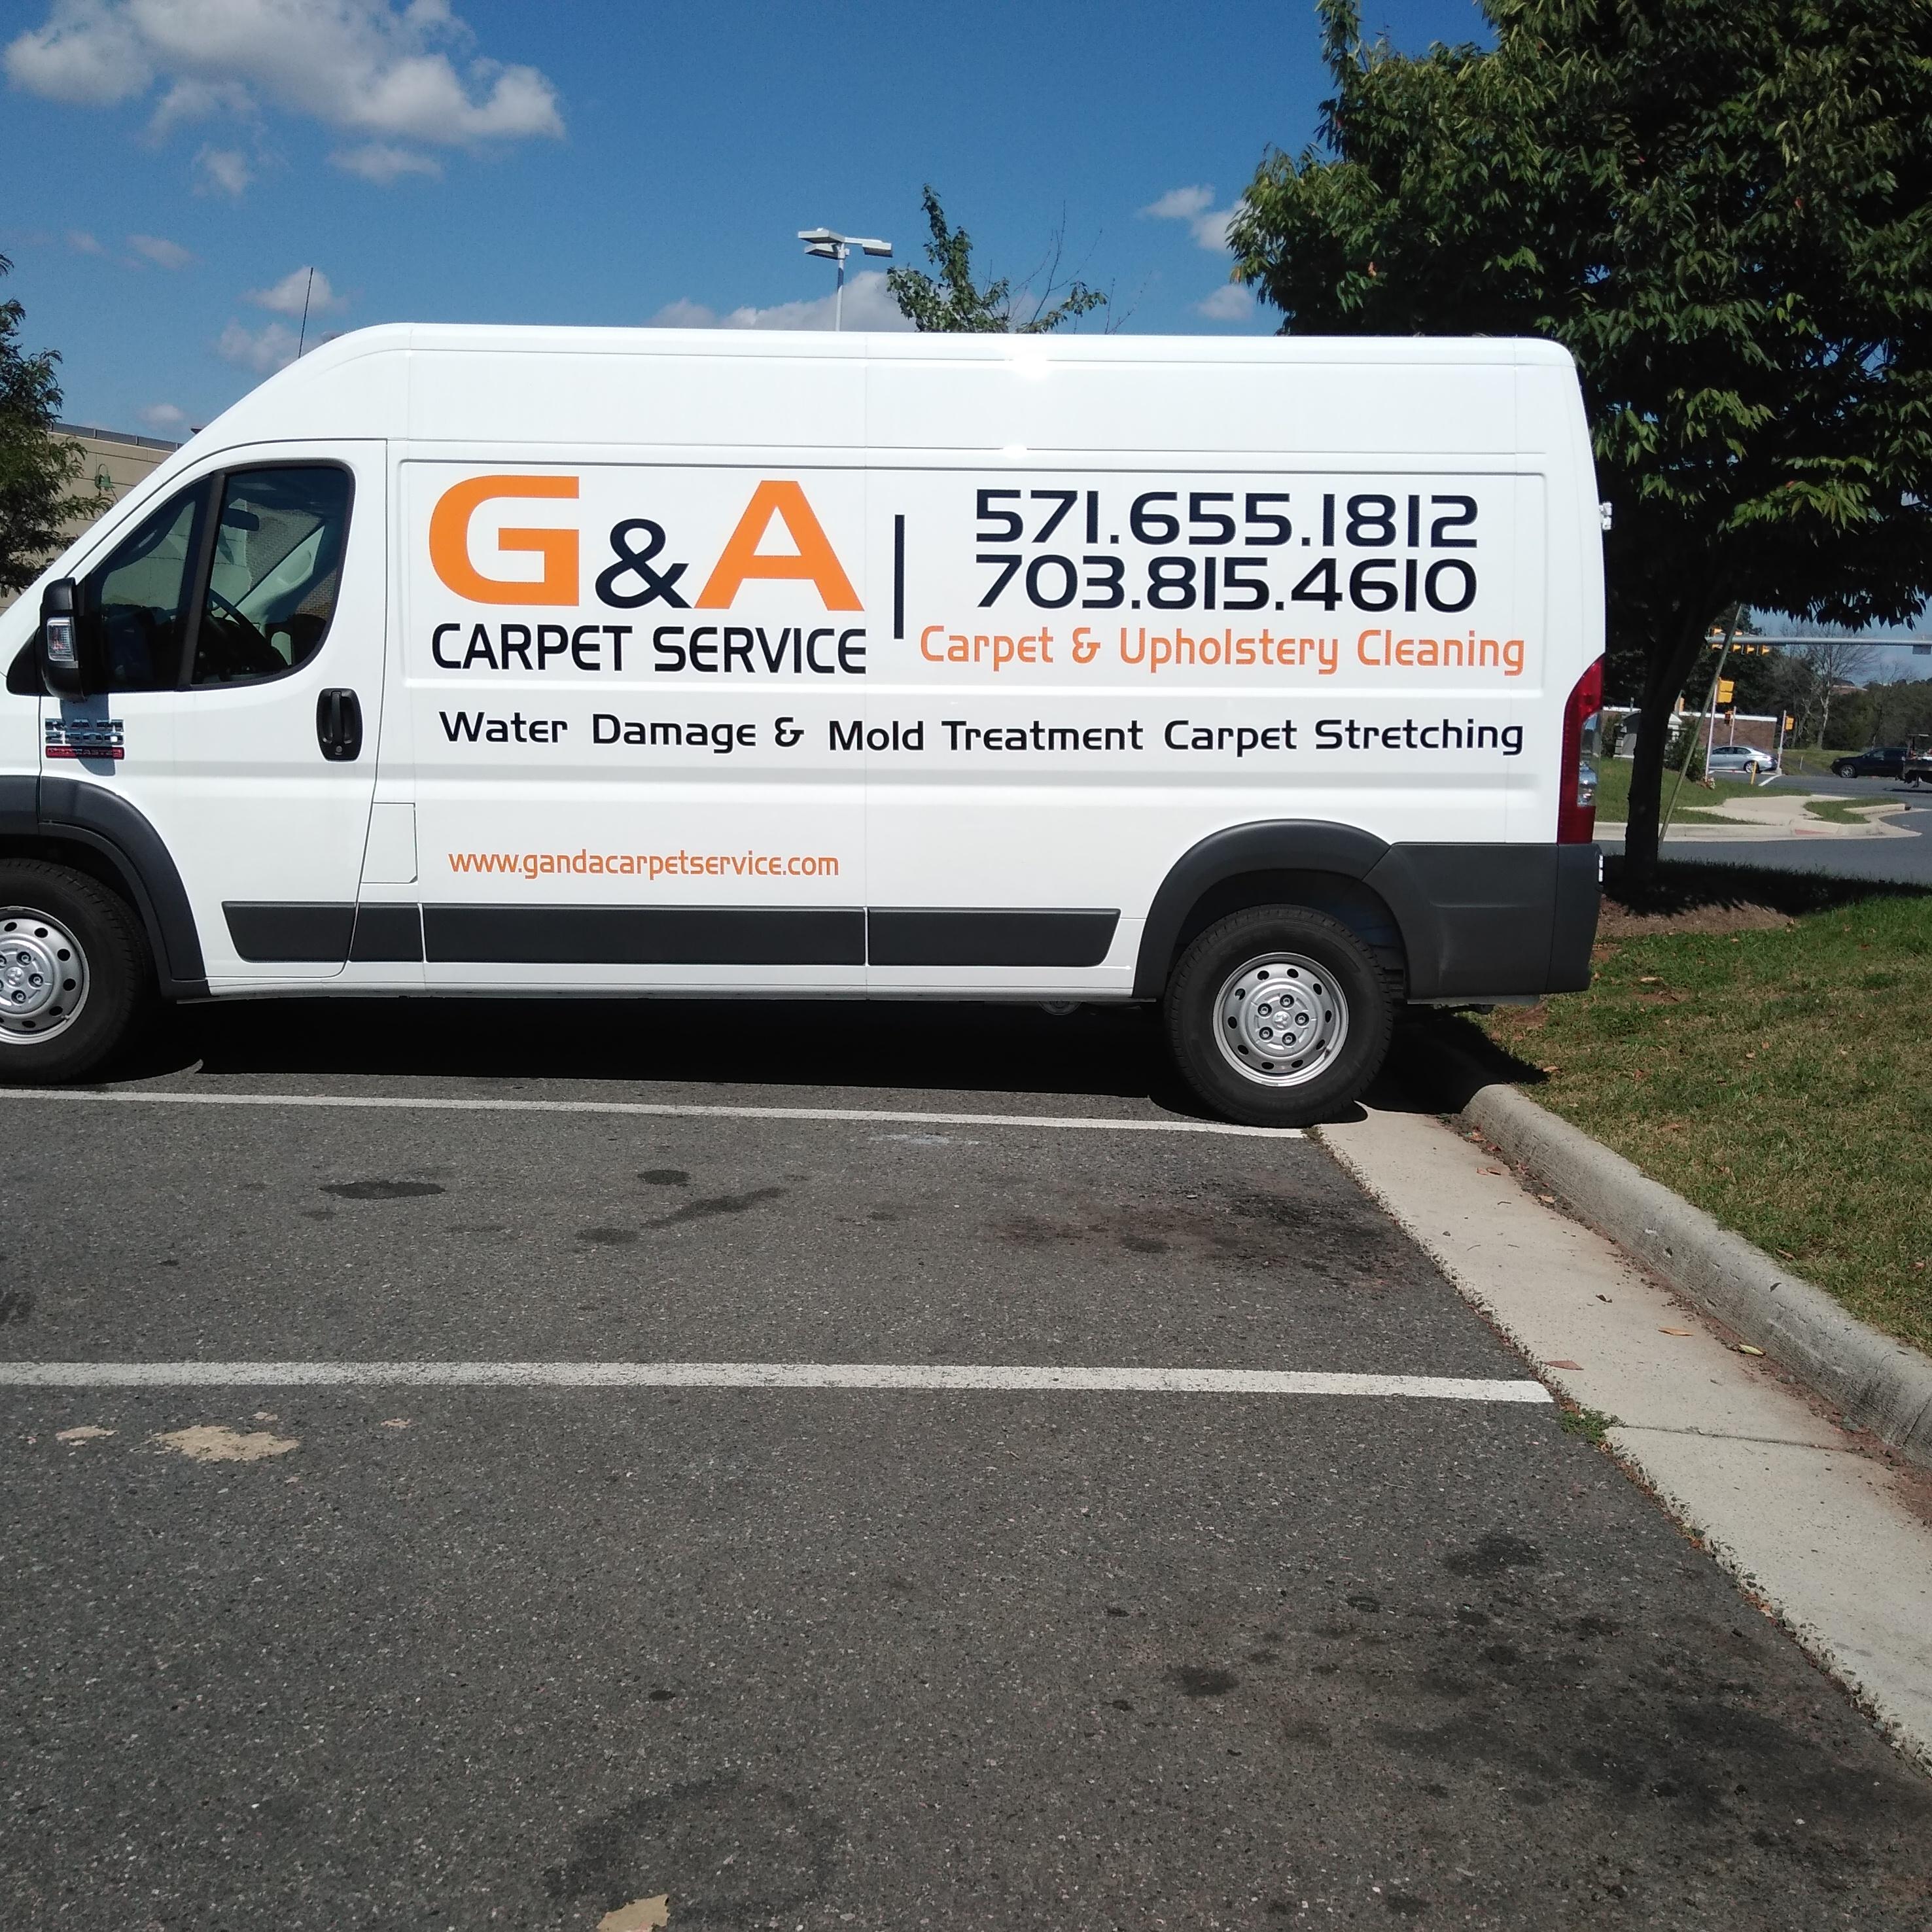 G & A Carpet Service